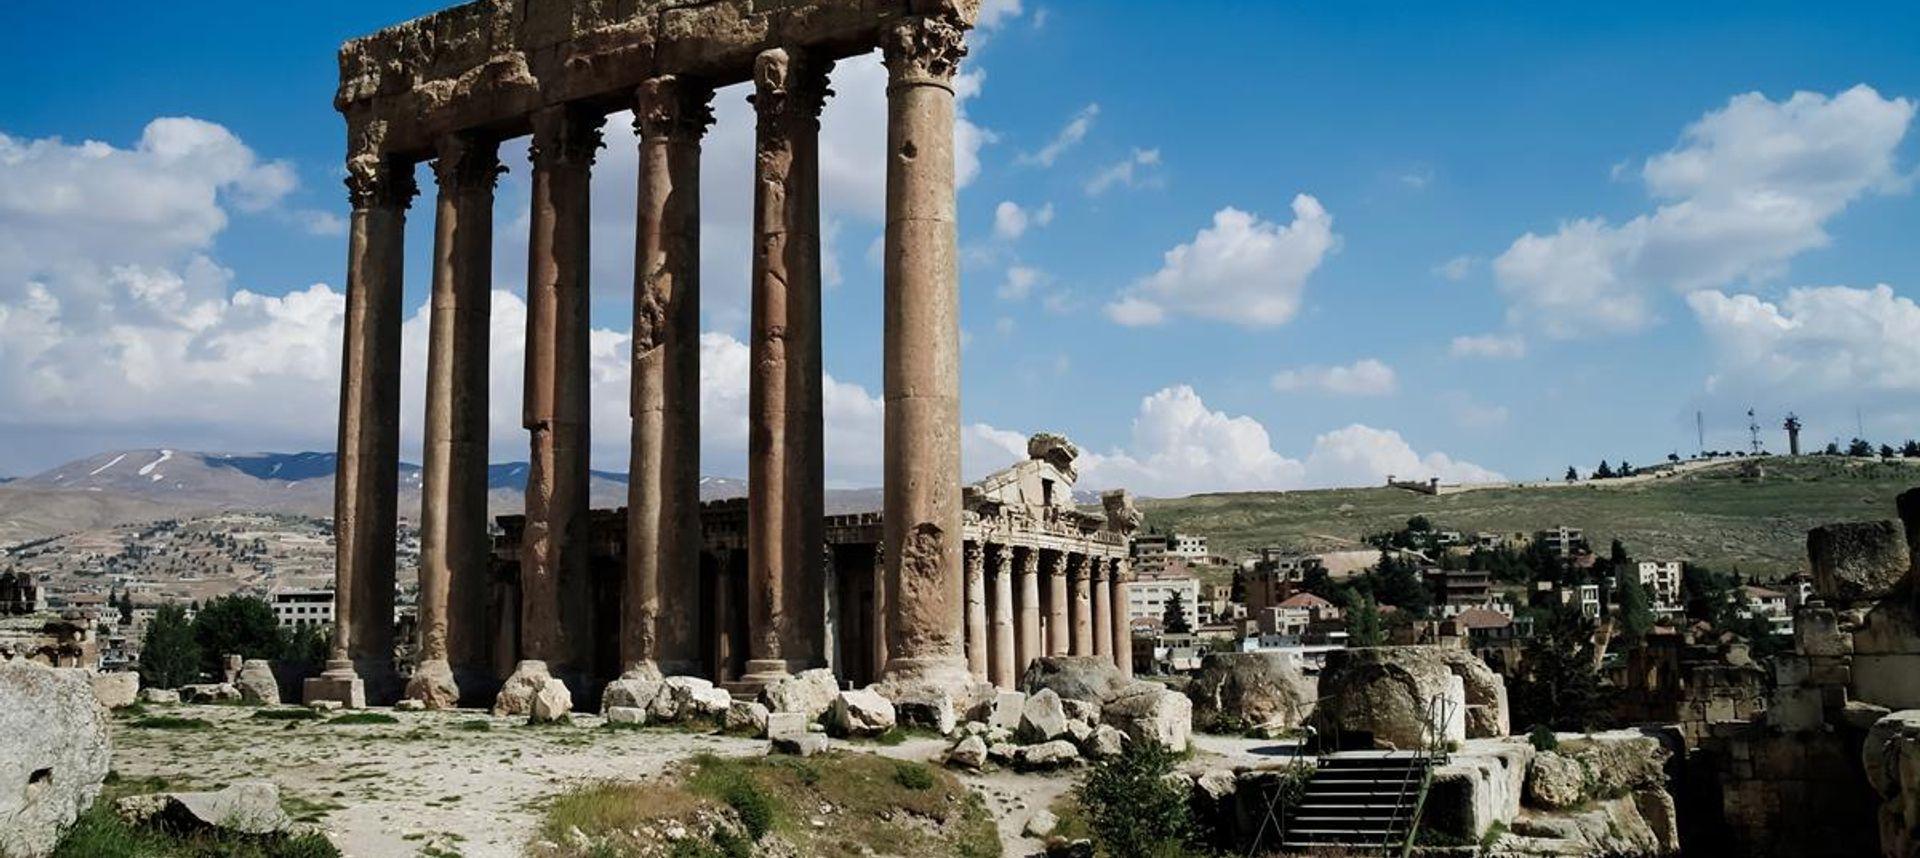 Roman ruins in Lebanon (Paul Morrison)